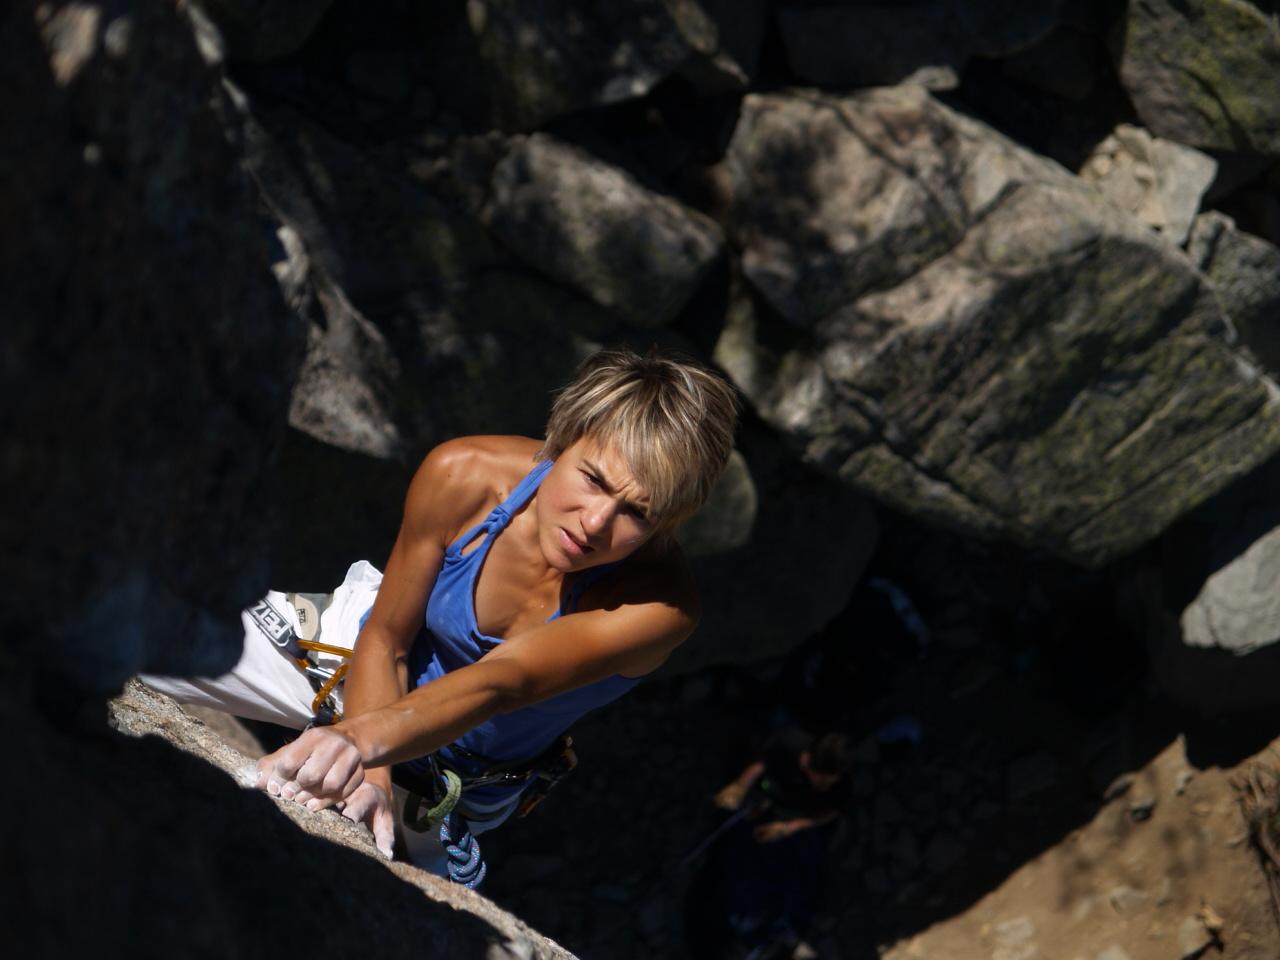 Ex-world champion and 8c+ climber Liv Sansoz, 222 kb